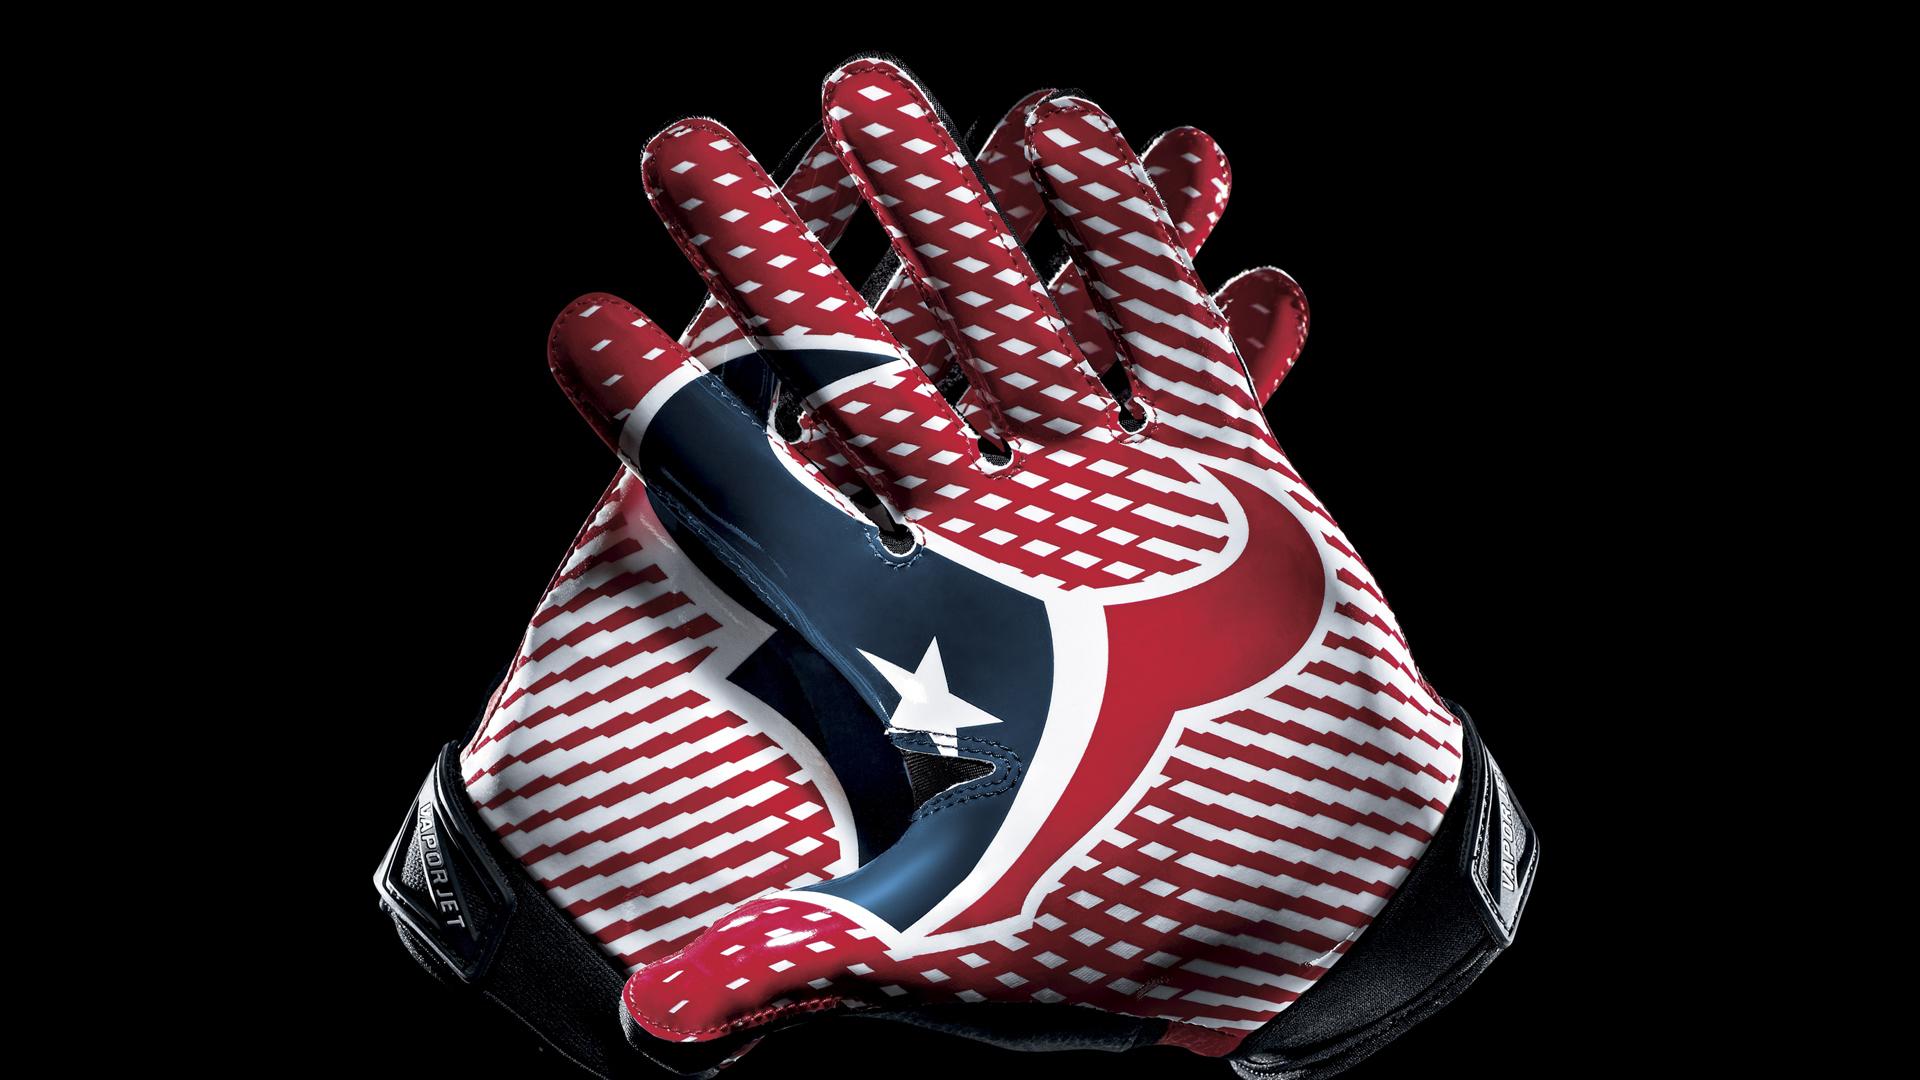 Texans HD